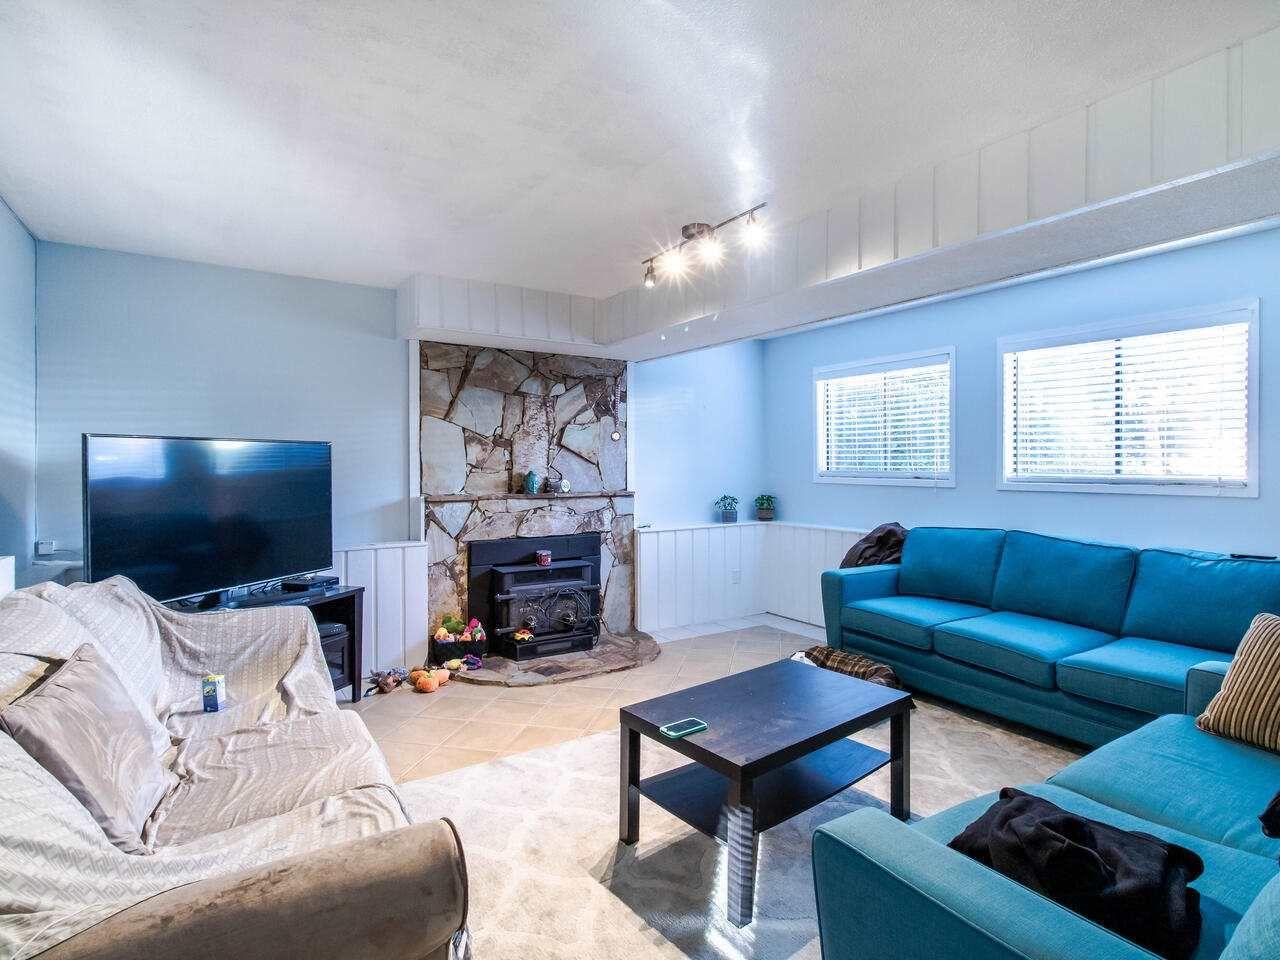 Photo 13: Photos: 11505 PEMBERTON Crescent in Delta: Annieville House for sale (N. Delta)  : MLS®# R2512135